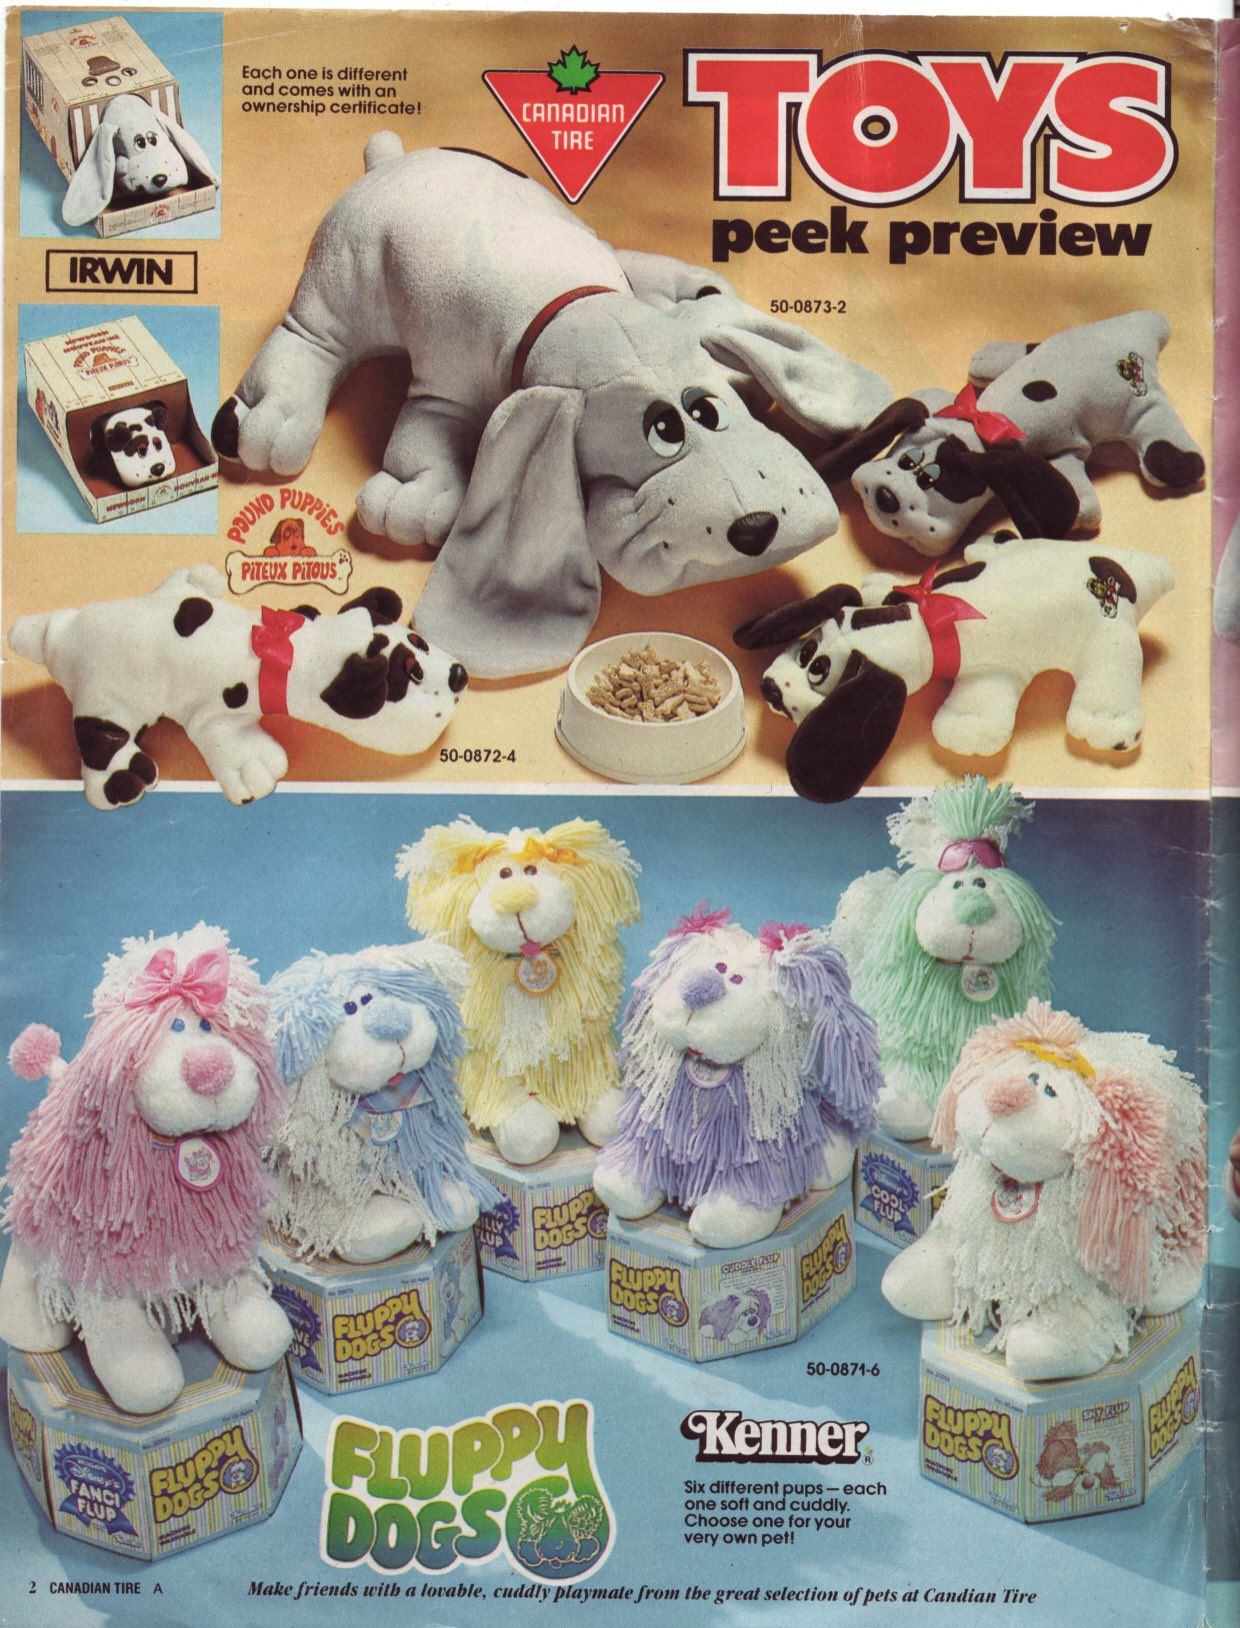 1986 Canadian Tire flyer mini catalogue catalog Toys peek